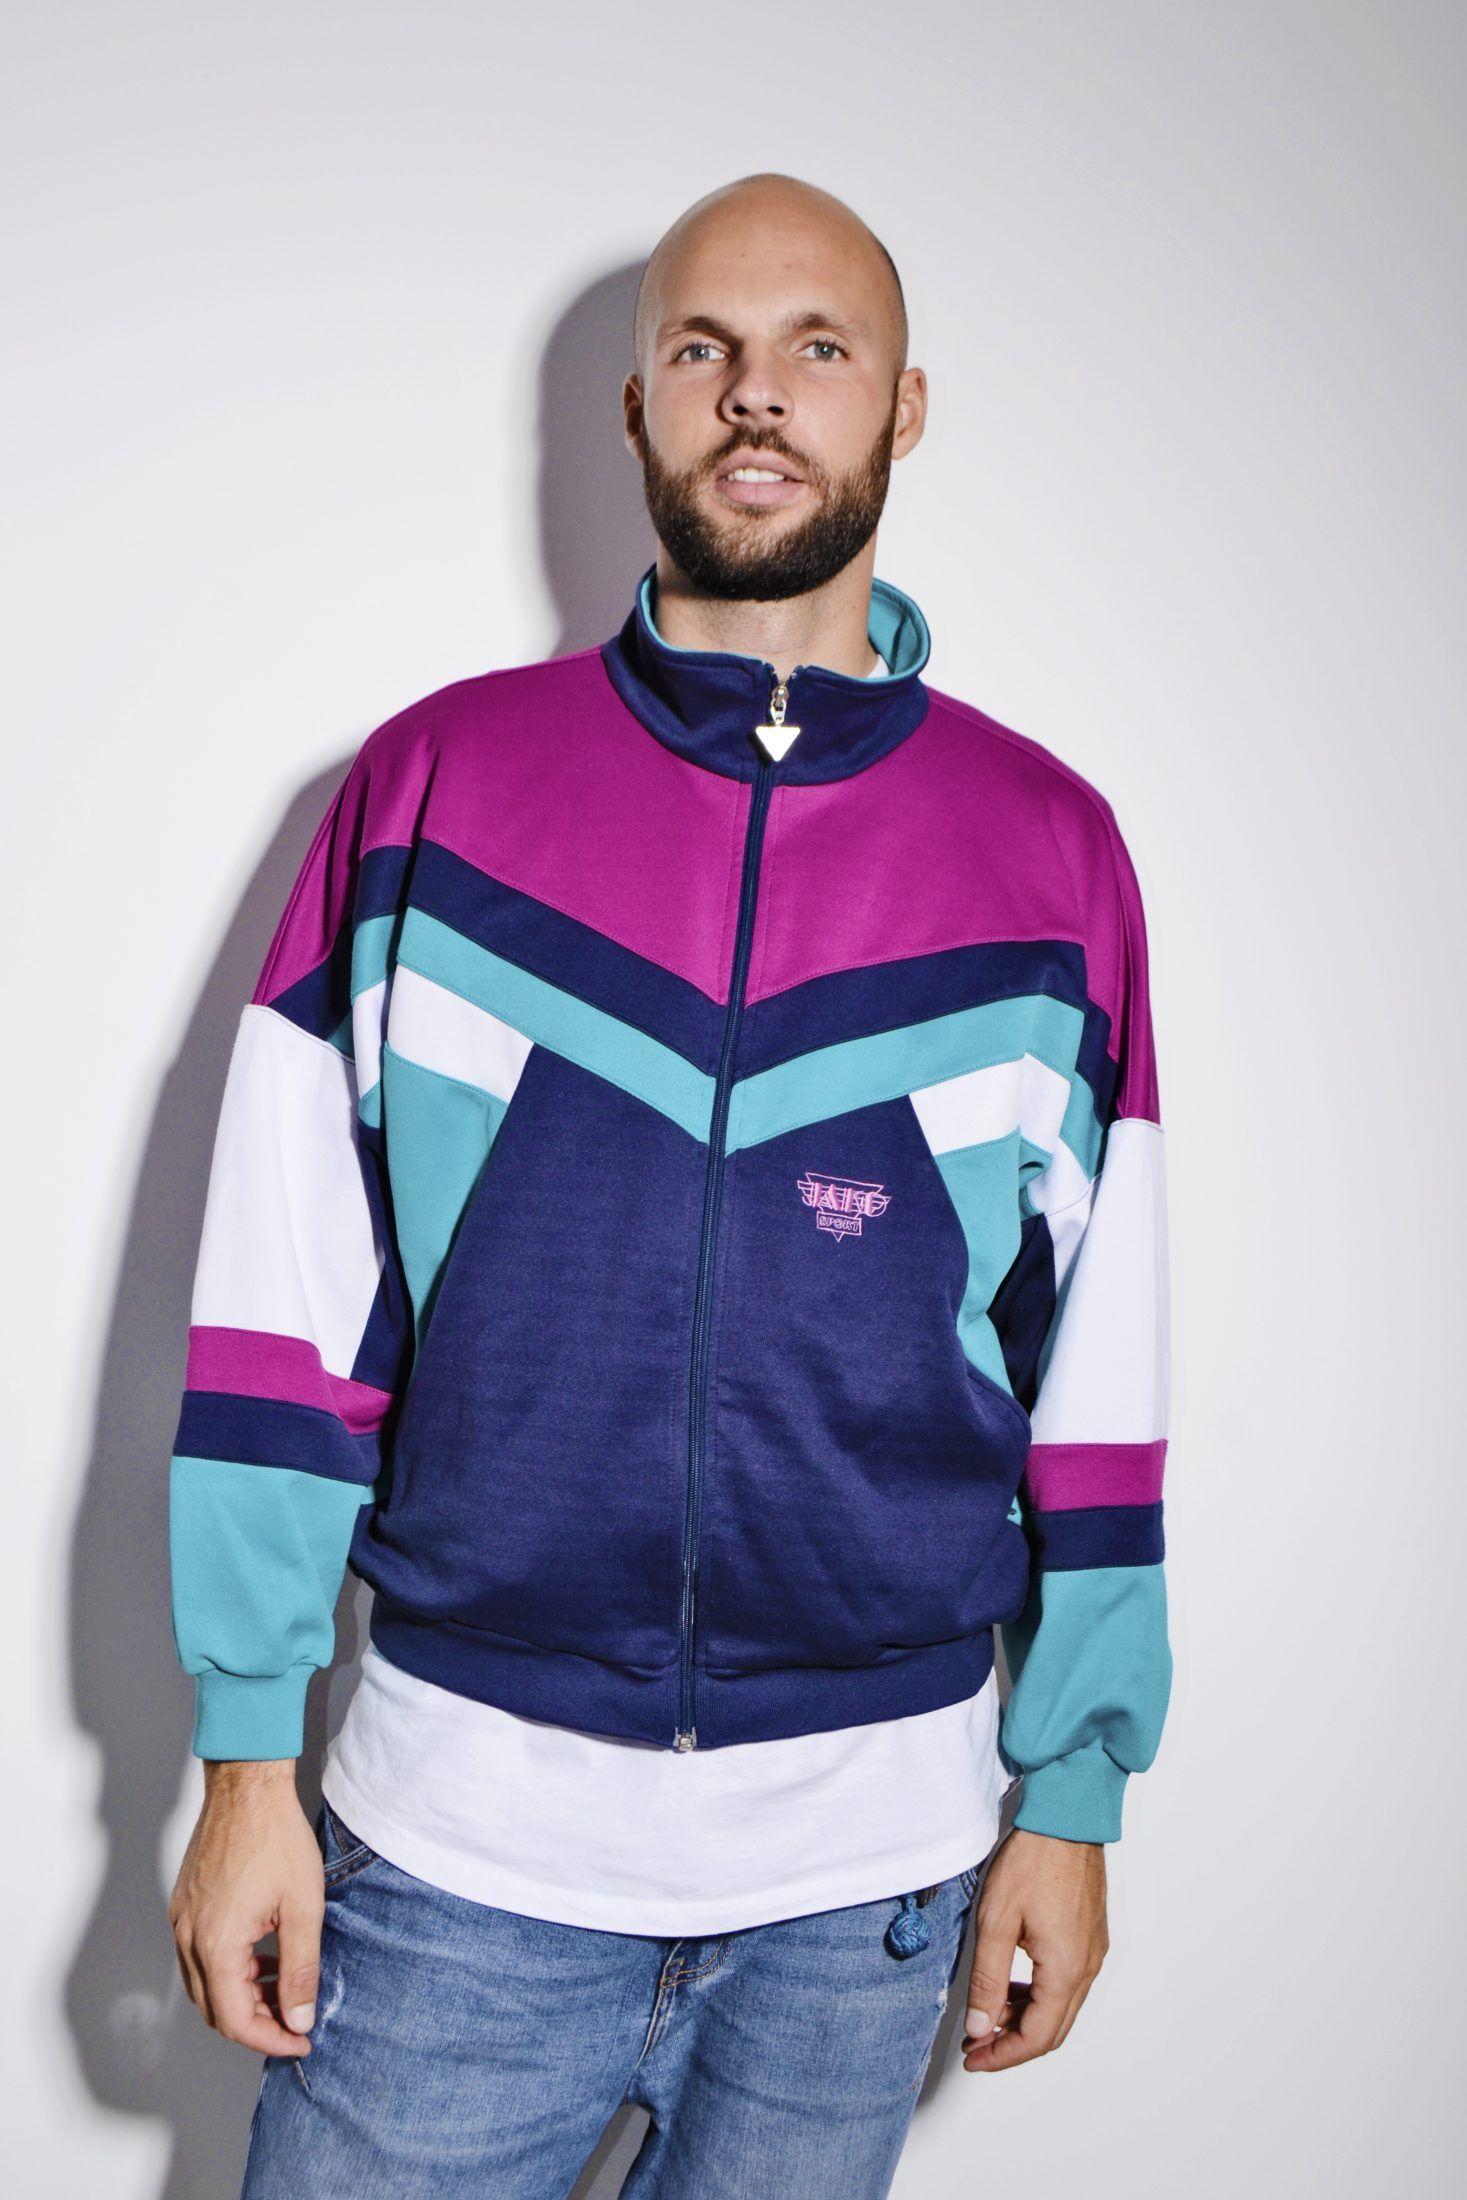 Vintage Puma Athleisure sweatshirt 90s zip up sweatshirt blue womens zipper jacket sweat shirt track jacket Vintage 80s Size Small